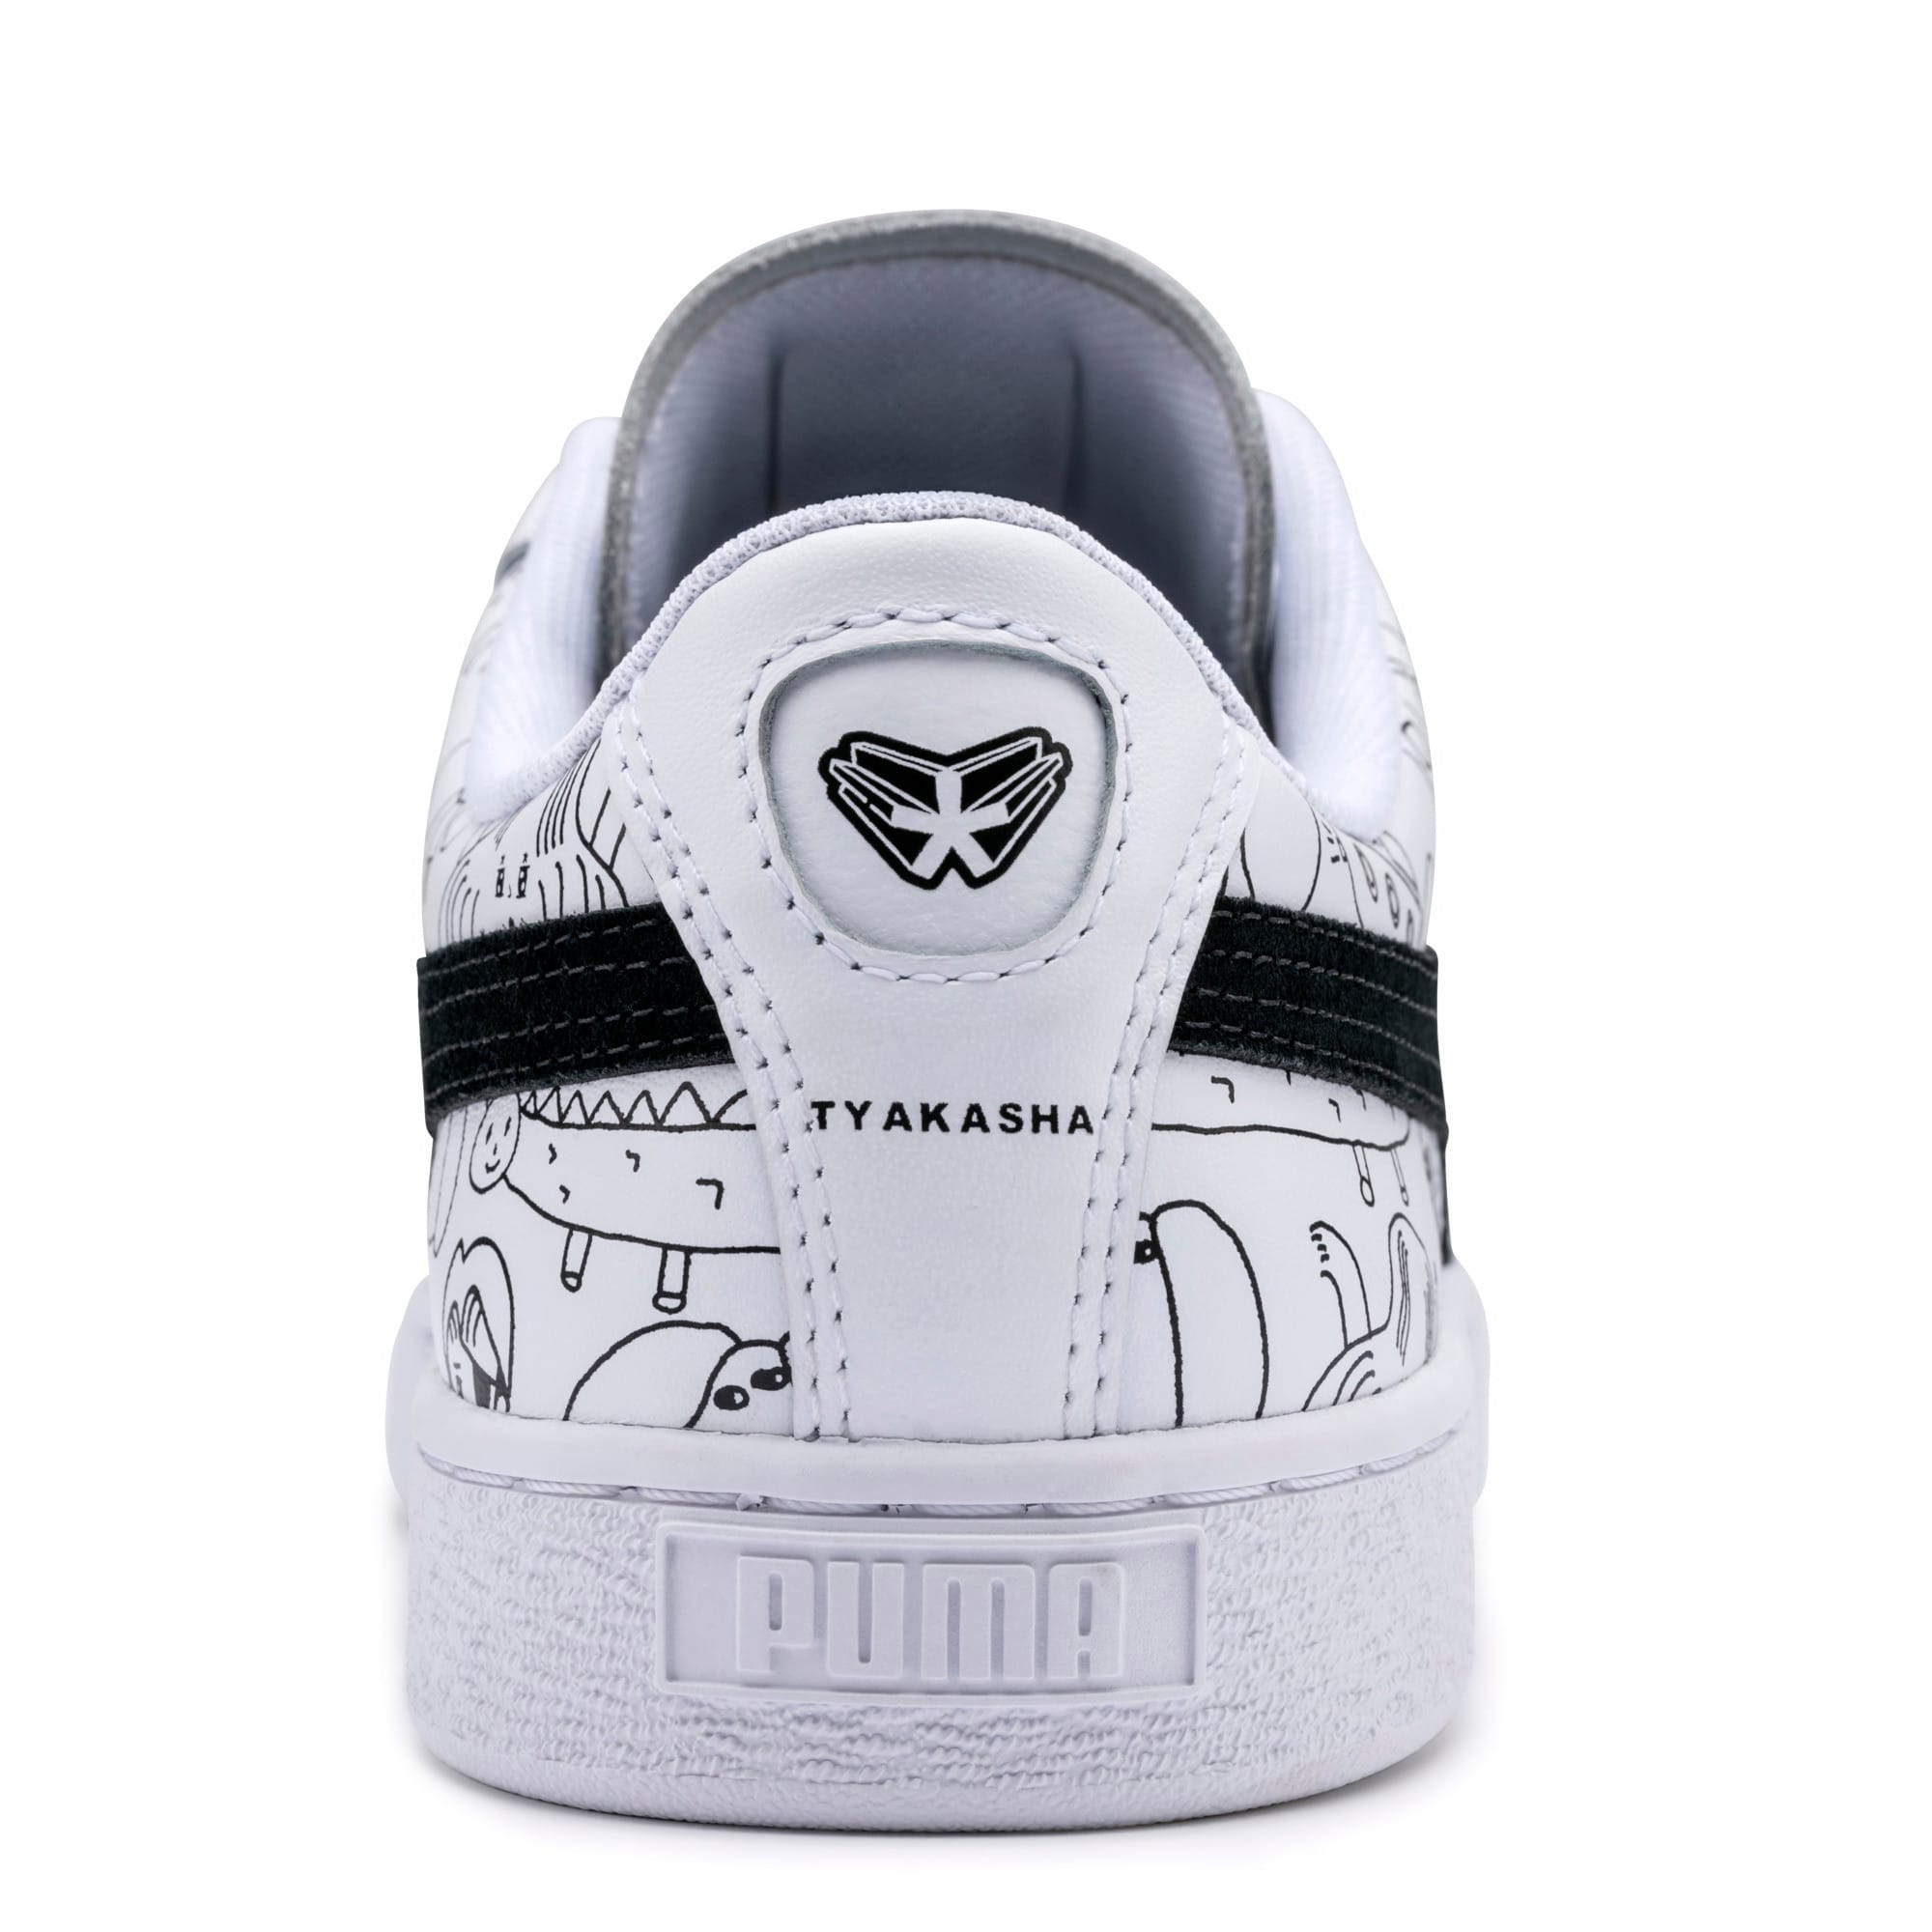 Thumbnail 10 of PUMA x TYAKASHA Basket Sneakers, Puma White-Puma Black, medium